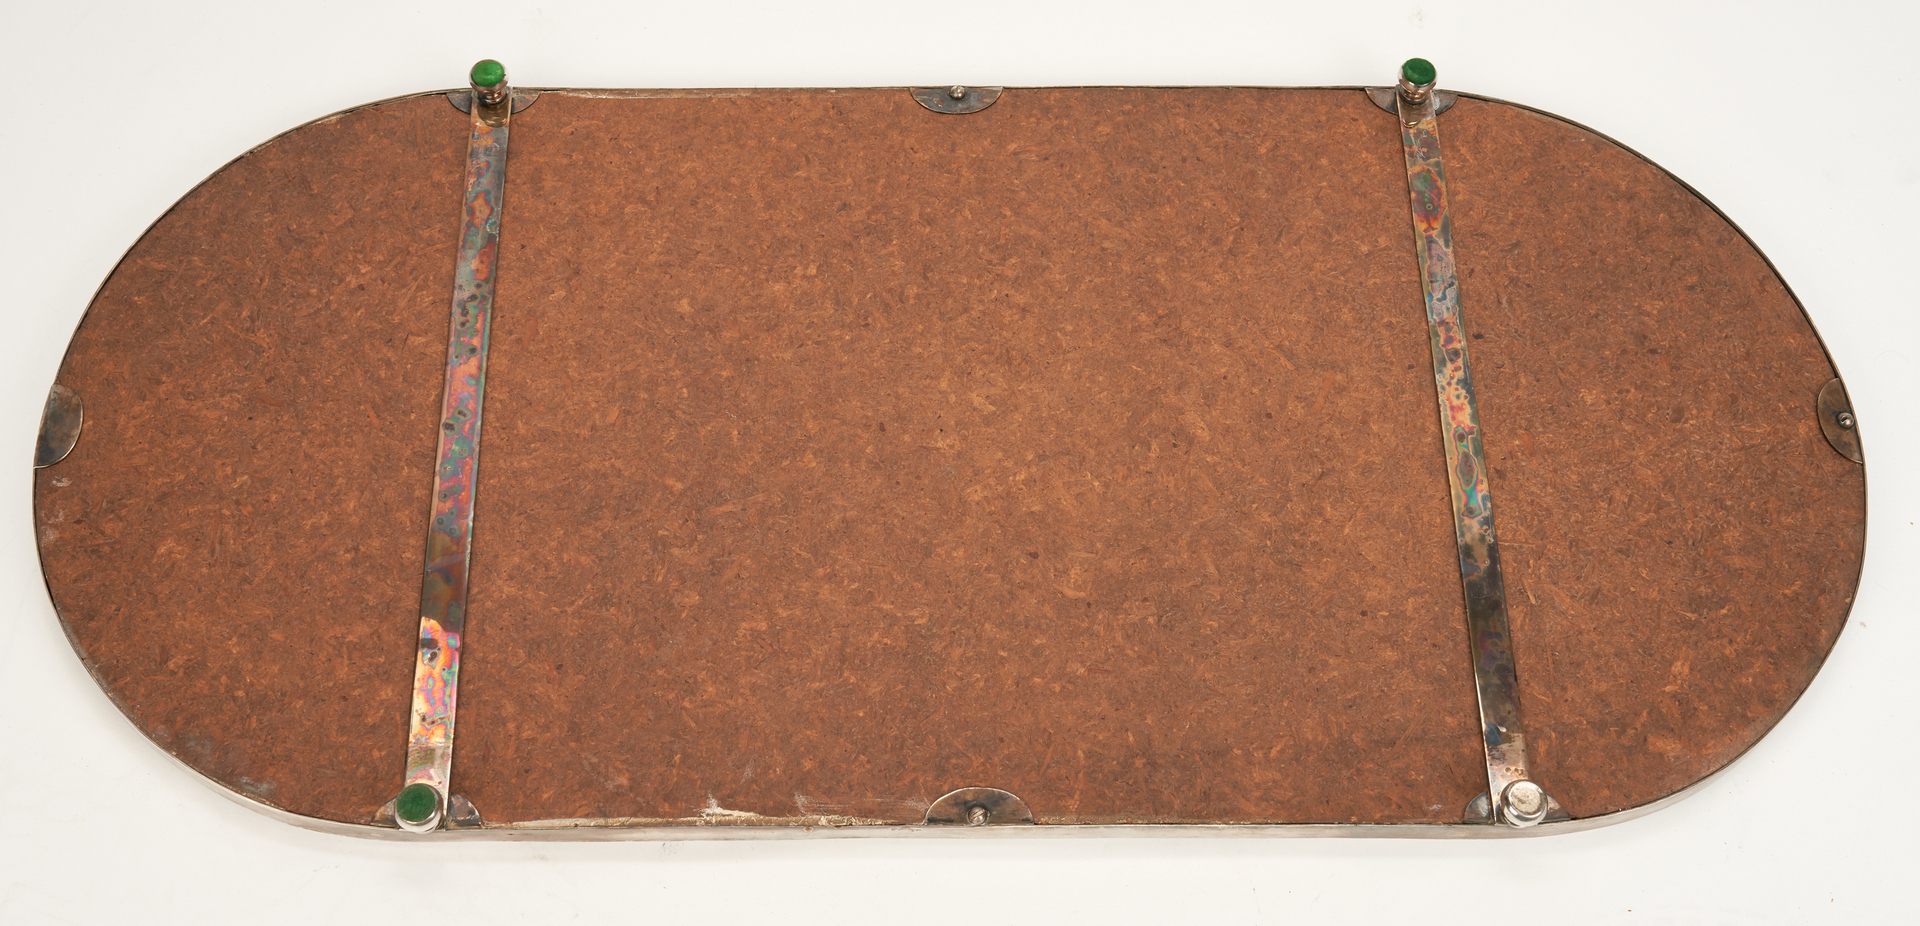 Lot 758: Silverplated Table Plateau